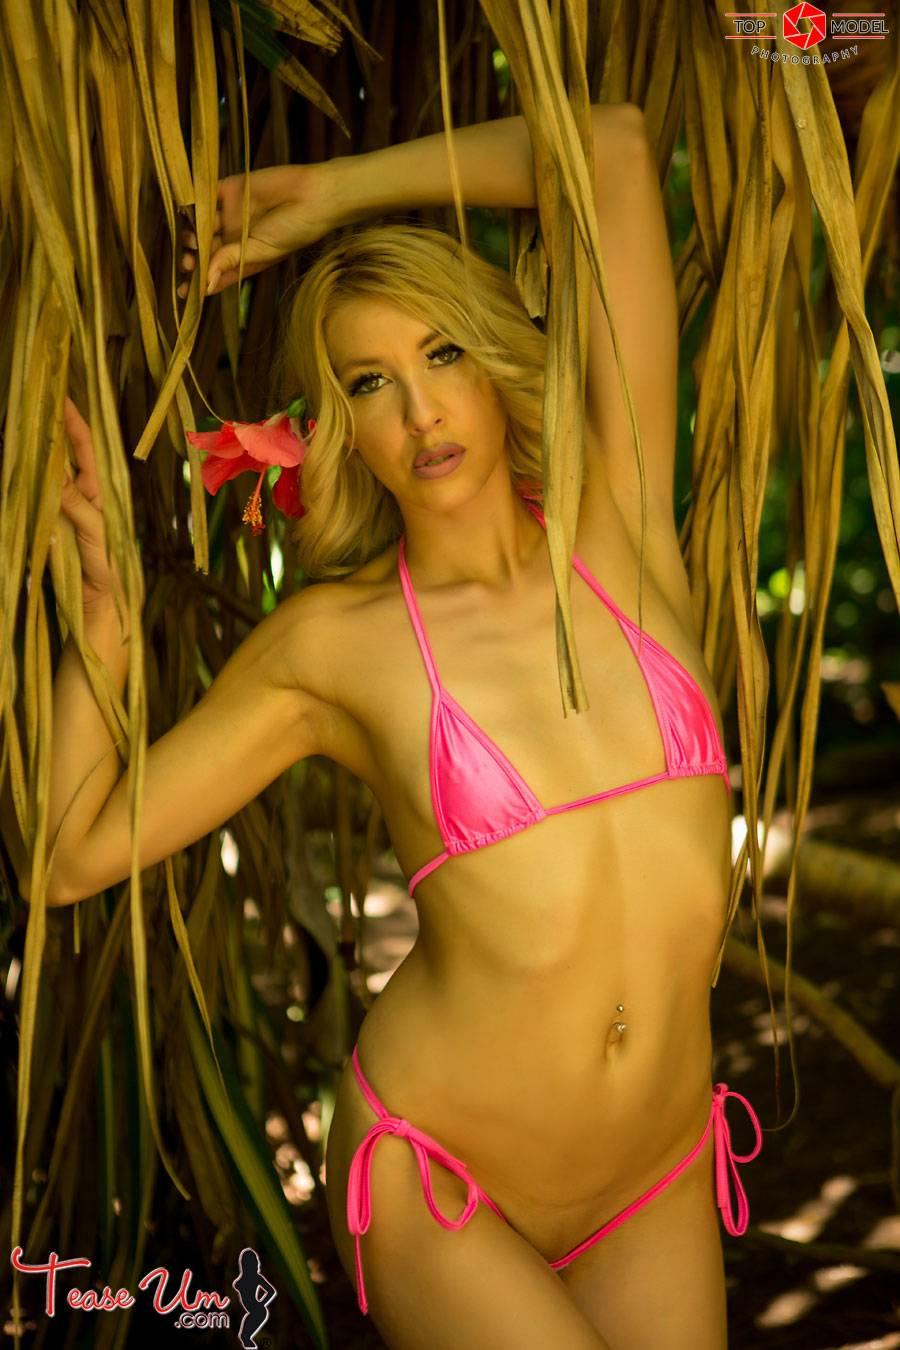 teaseum model lyndsey love naked pics thumb 1